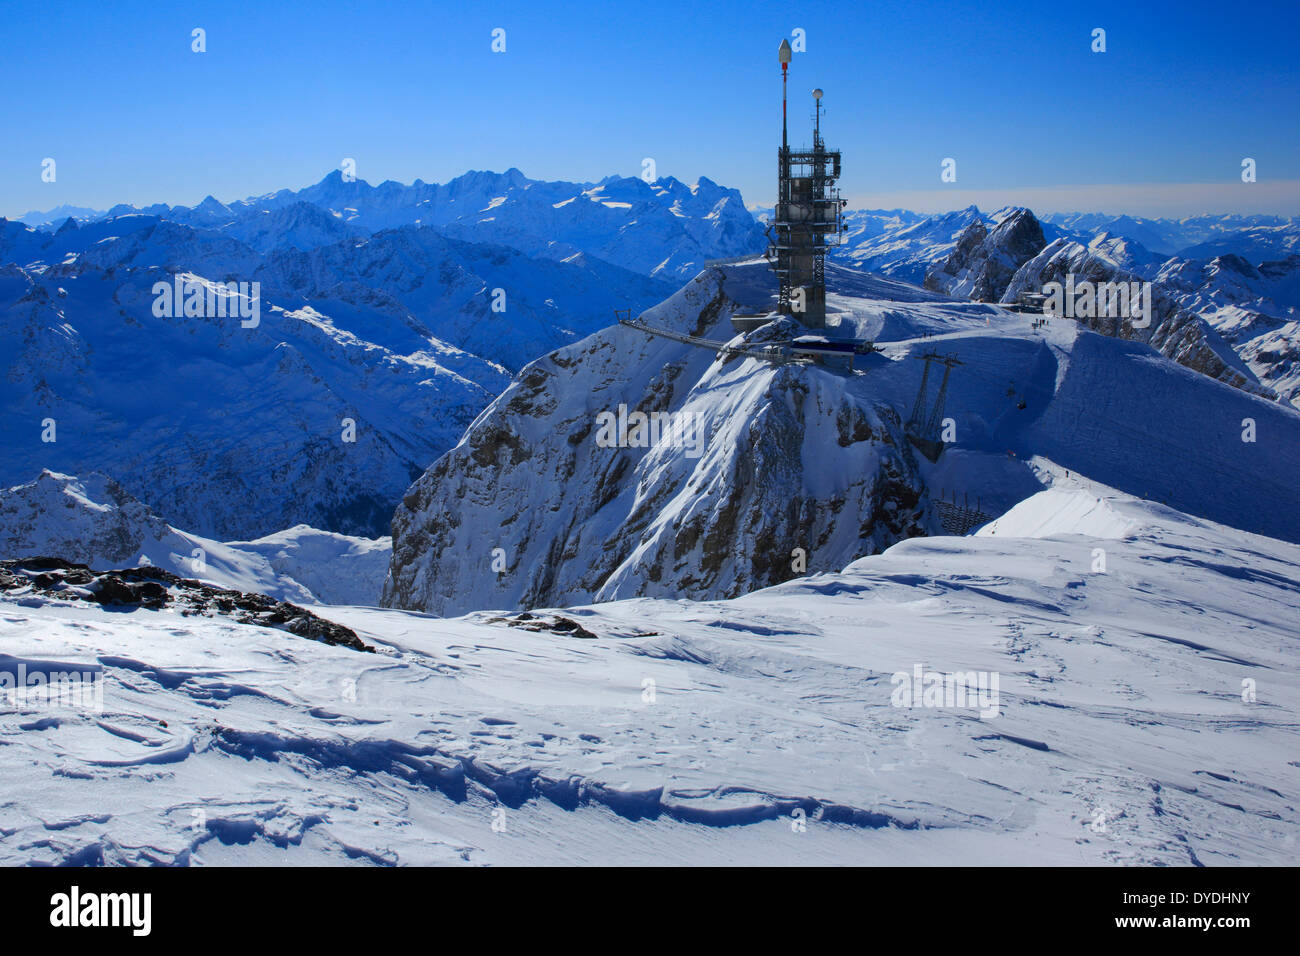 Alps view mountain mountain panorama mountains Bern Bernese Alps radio tower mountains sky massif Obwalden panorama snow Swi - Stock Image